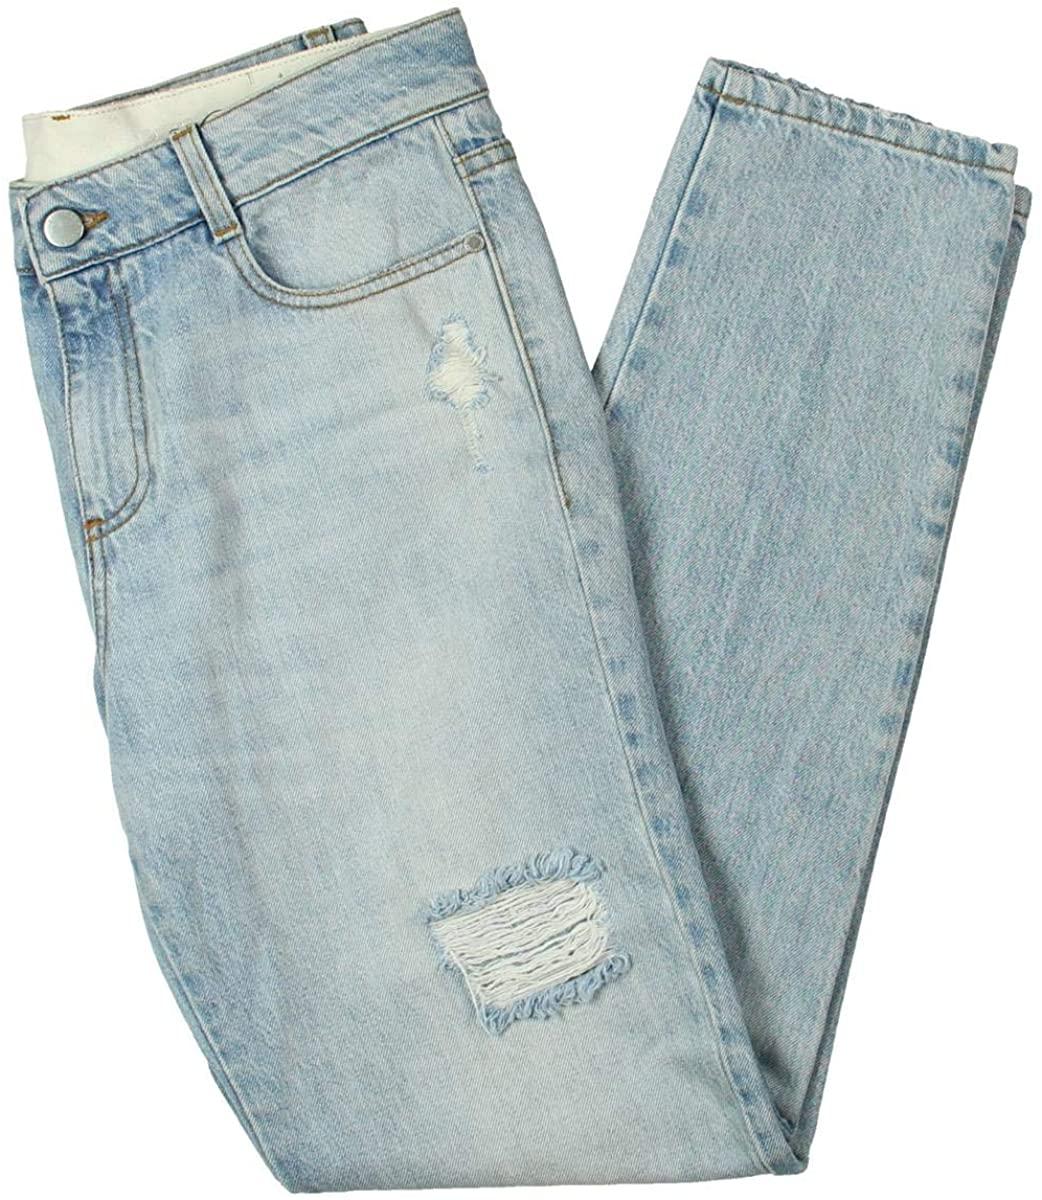 Stella McCartney Womens Denim Mid-Rise Jeans